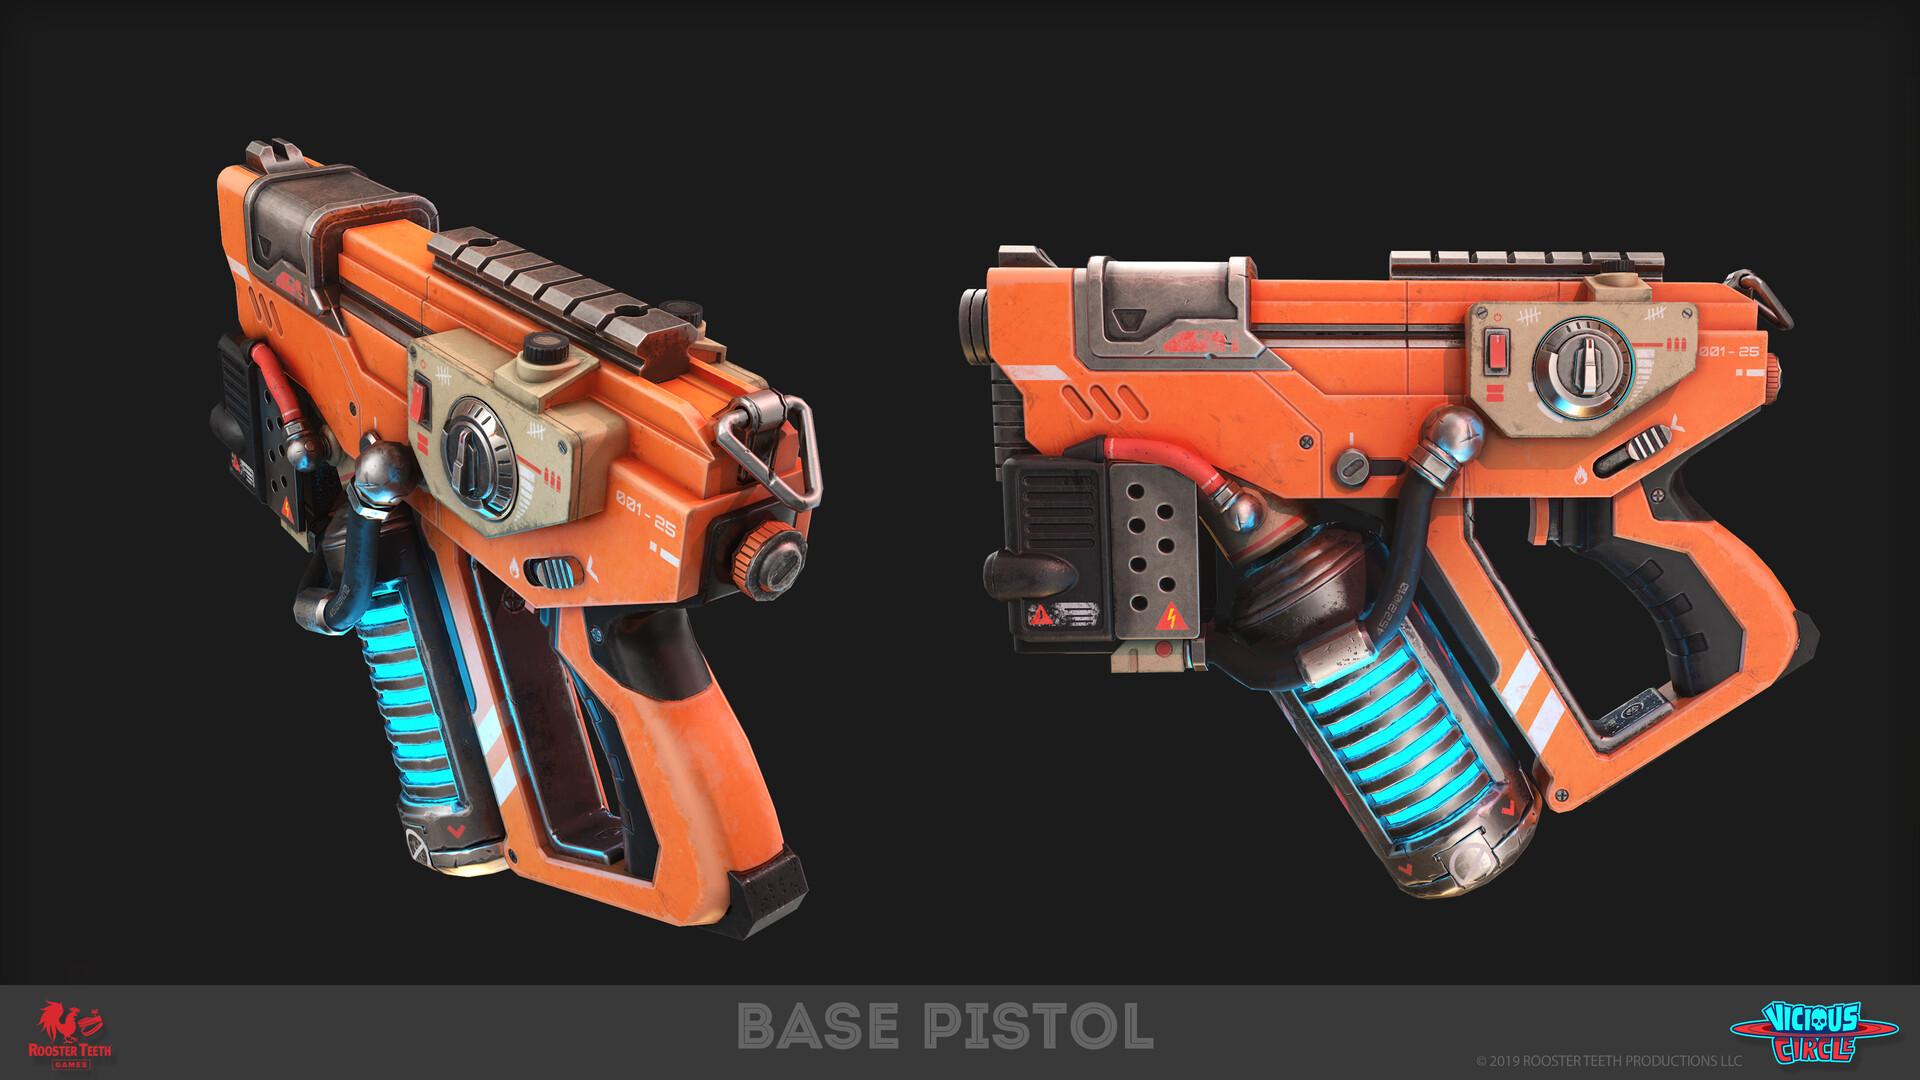 Markel milanes markel milanes pistol 03